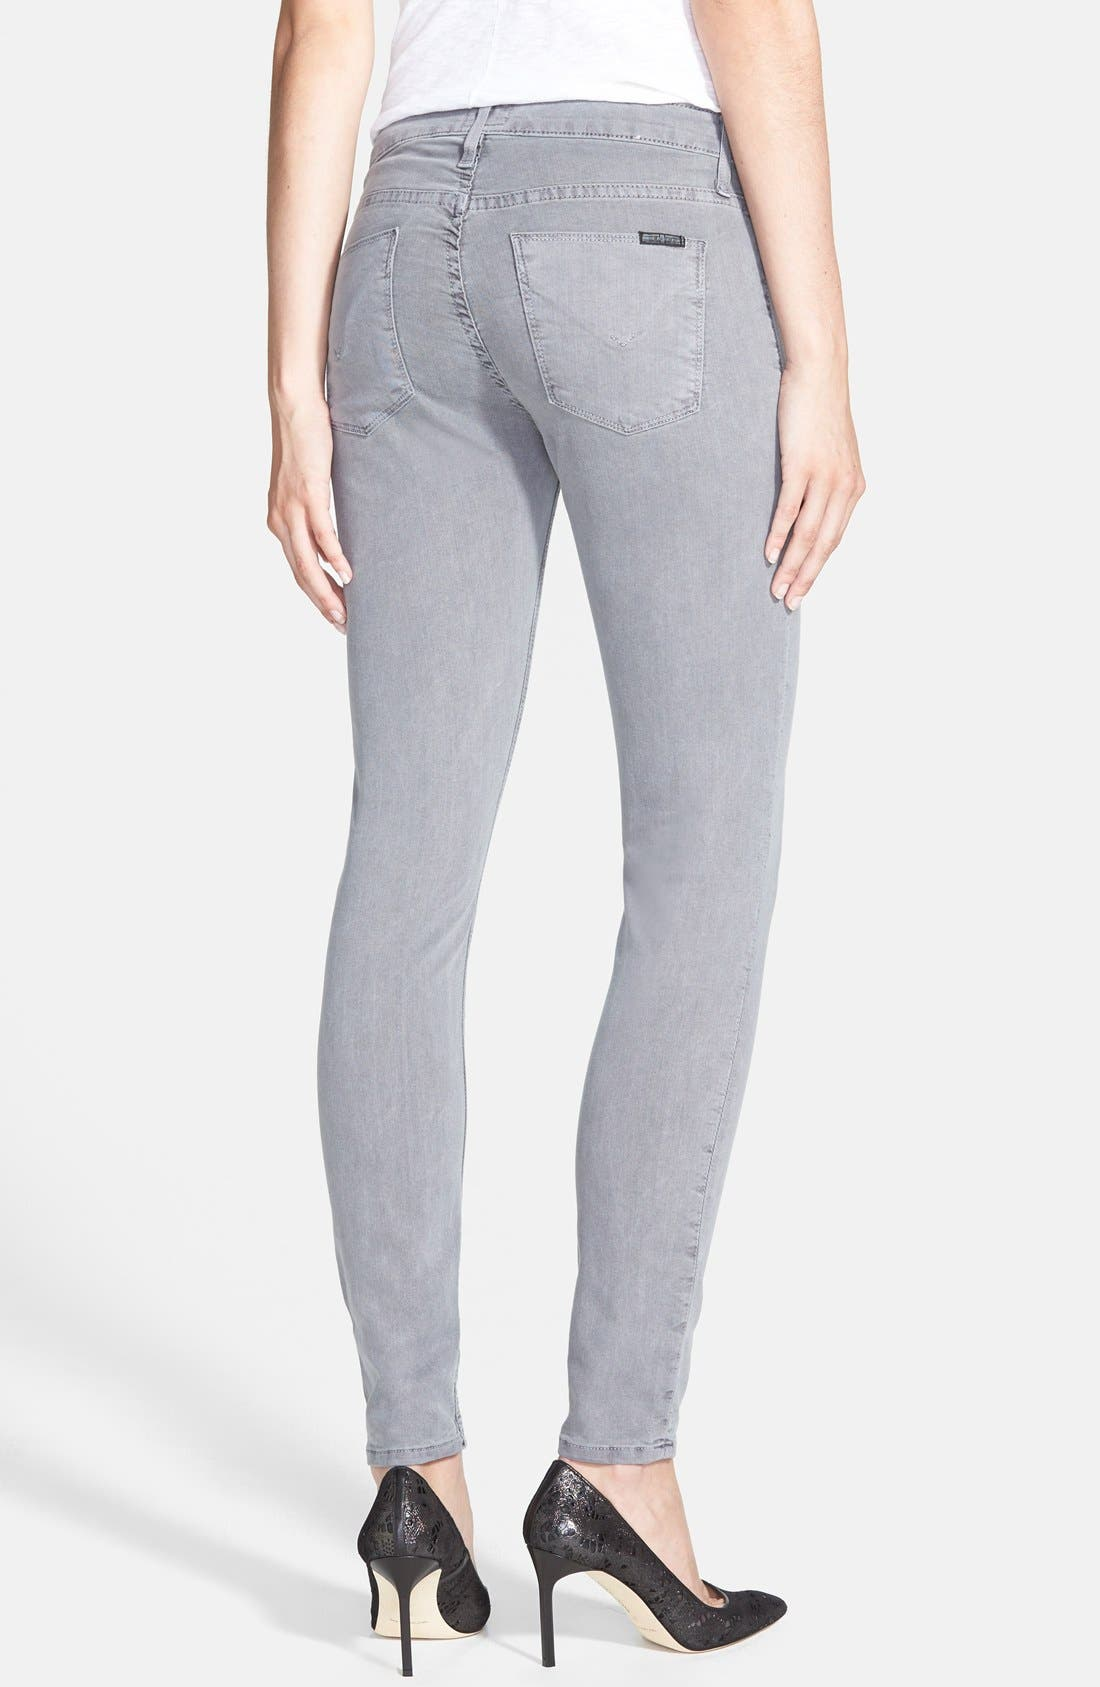 Alternate Image 2  - Hudson Jeans 'Nico' Skinny Overdyed Jeans (Grey Wash)